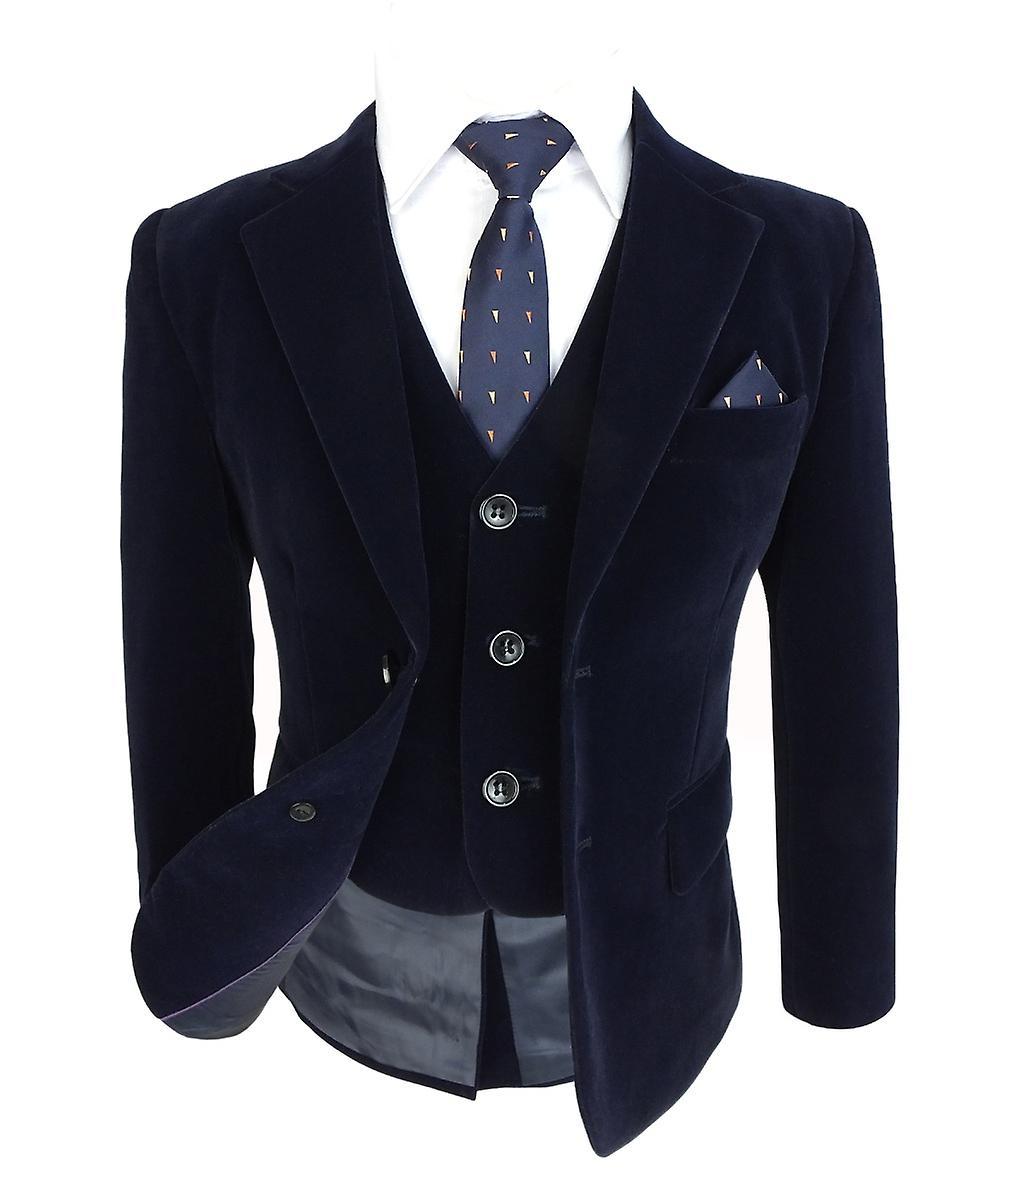 garçons Slim Fit Navy velours Suit